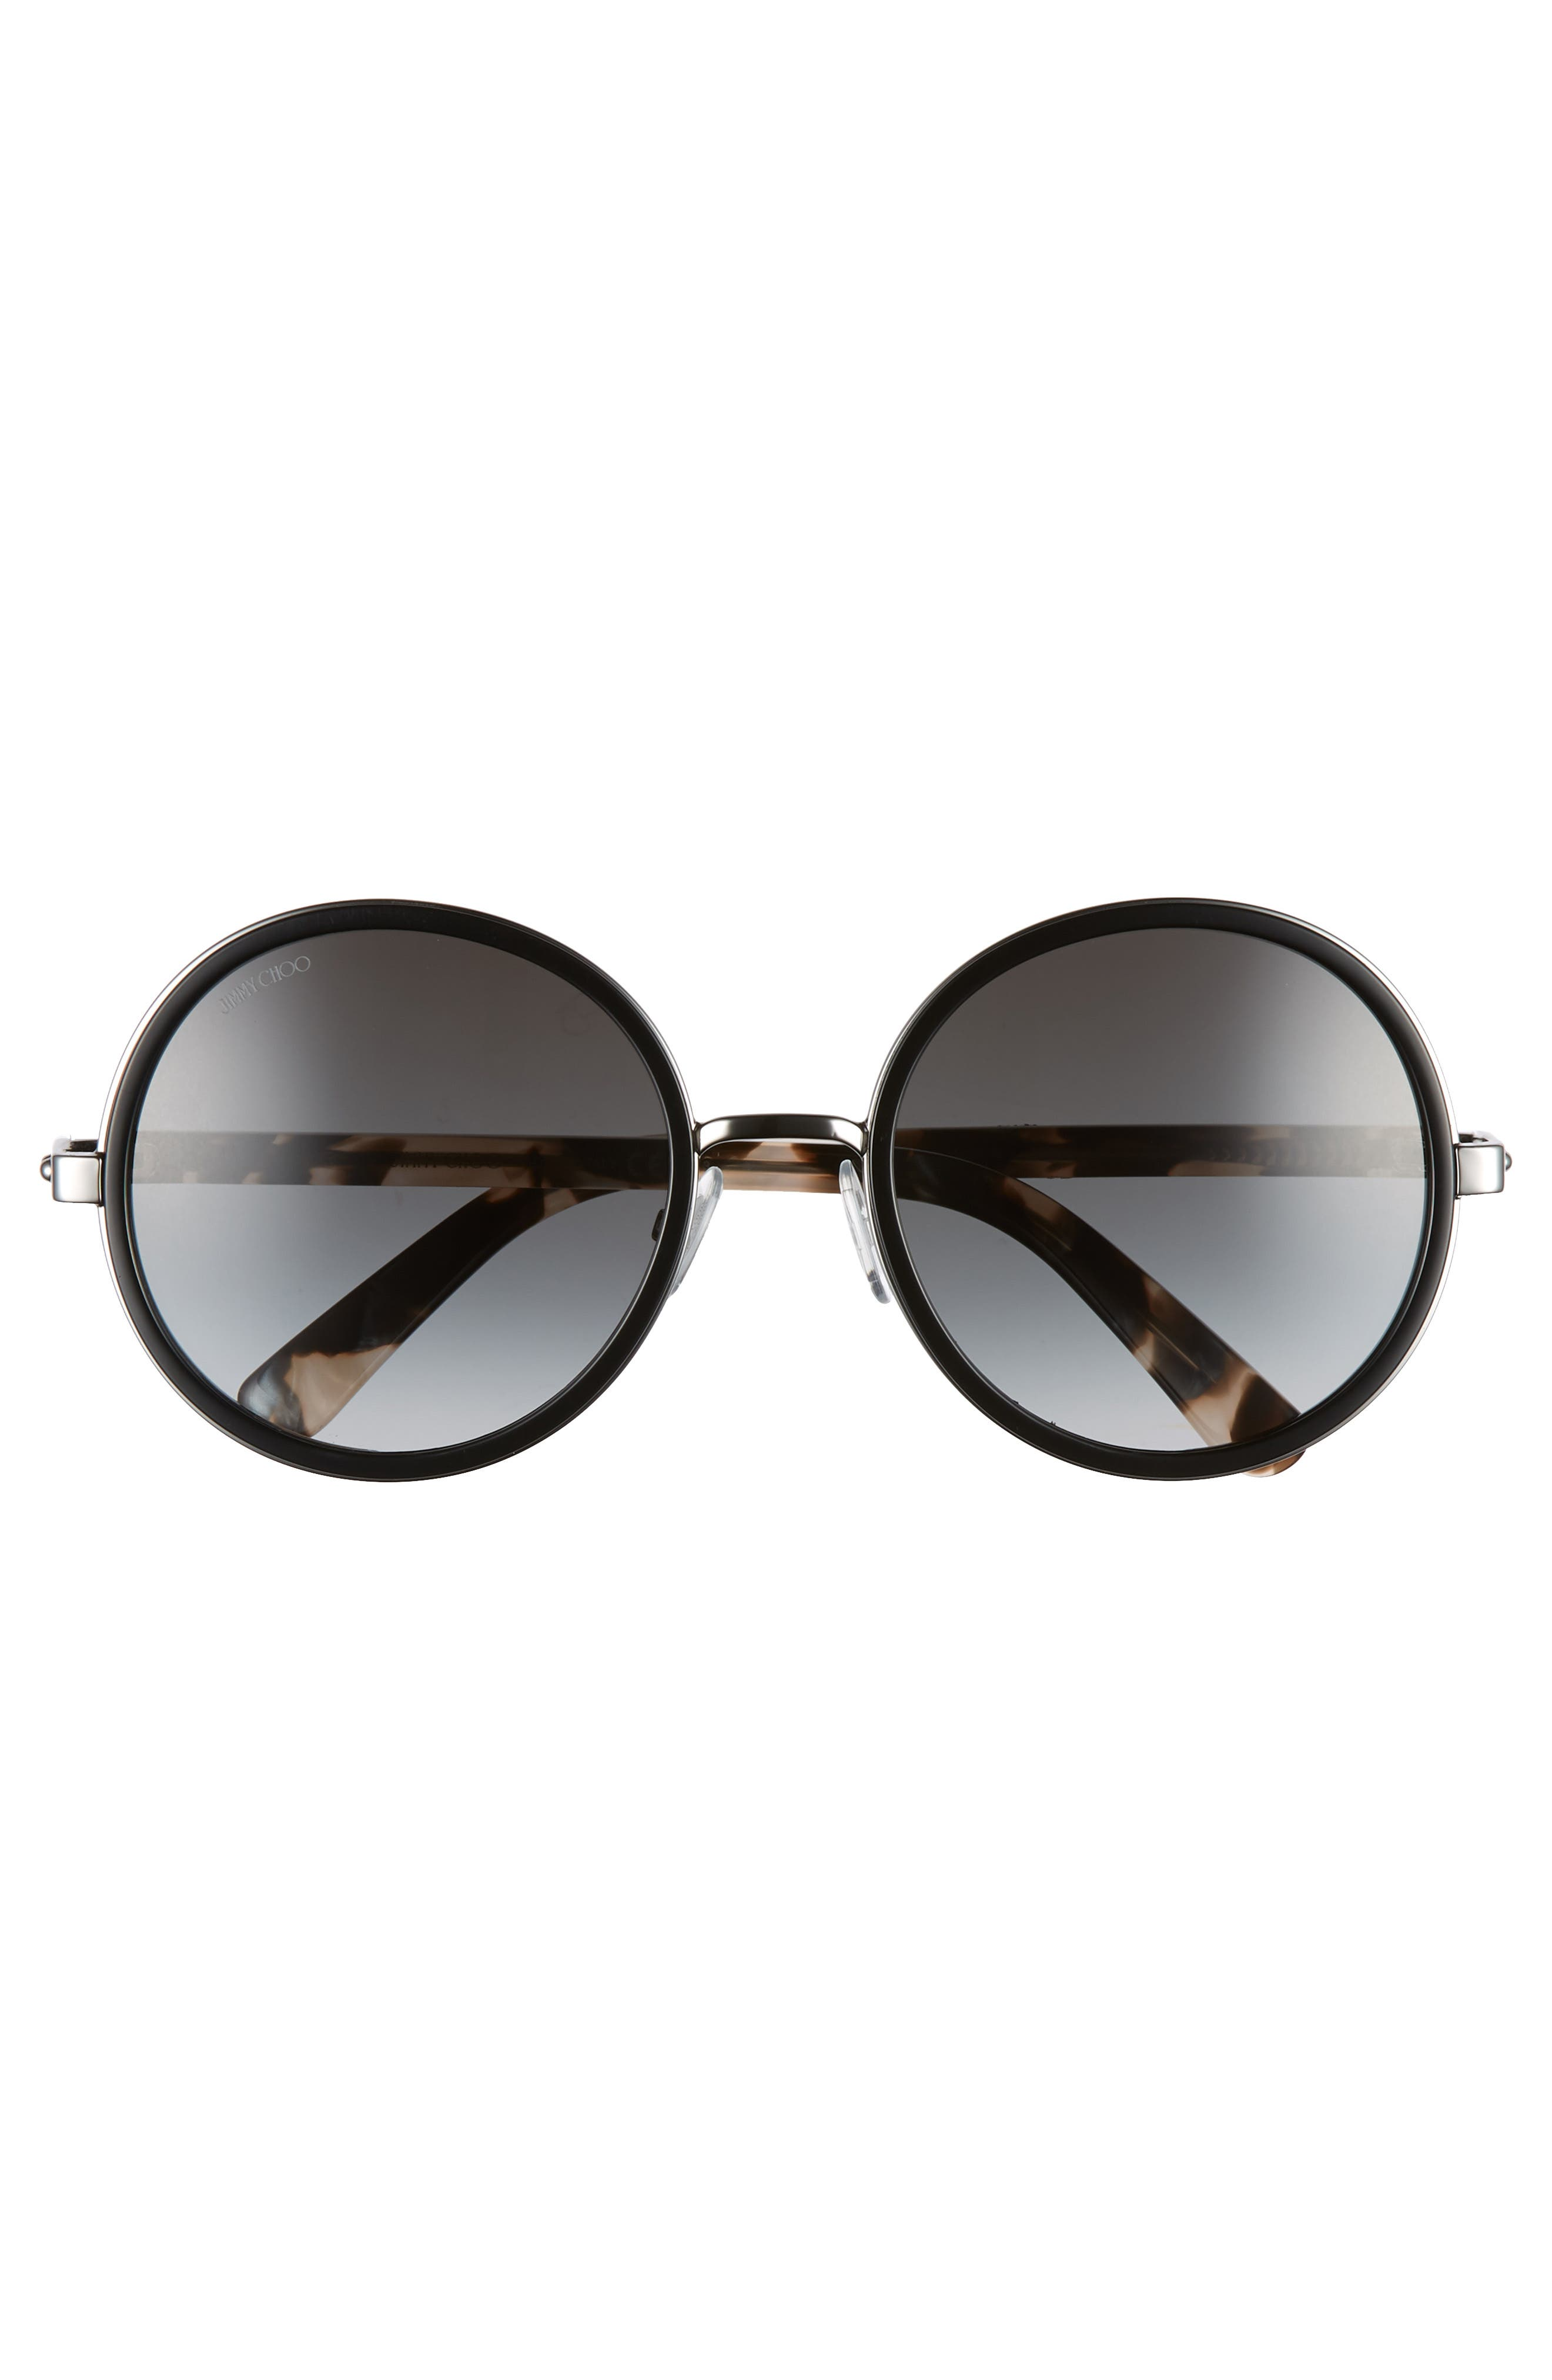 Andiens 54mm Round Sunglasses,                             Alternate thumbnail 3, color,                             BLACK